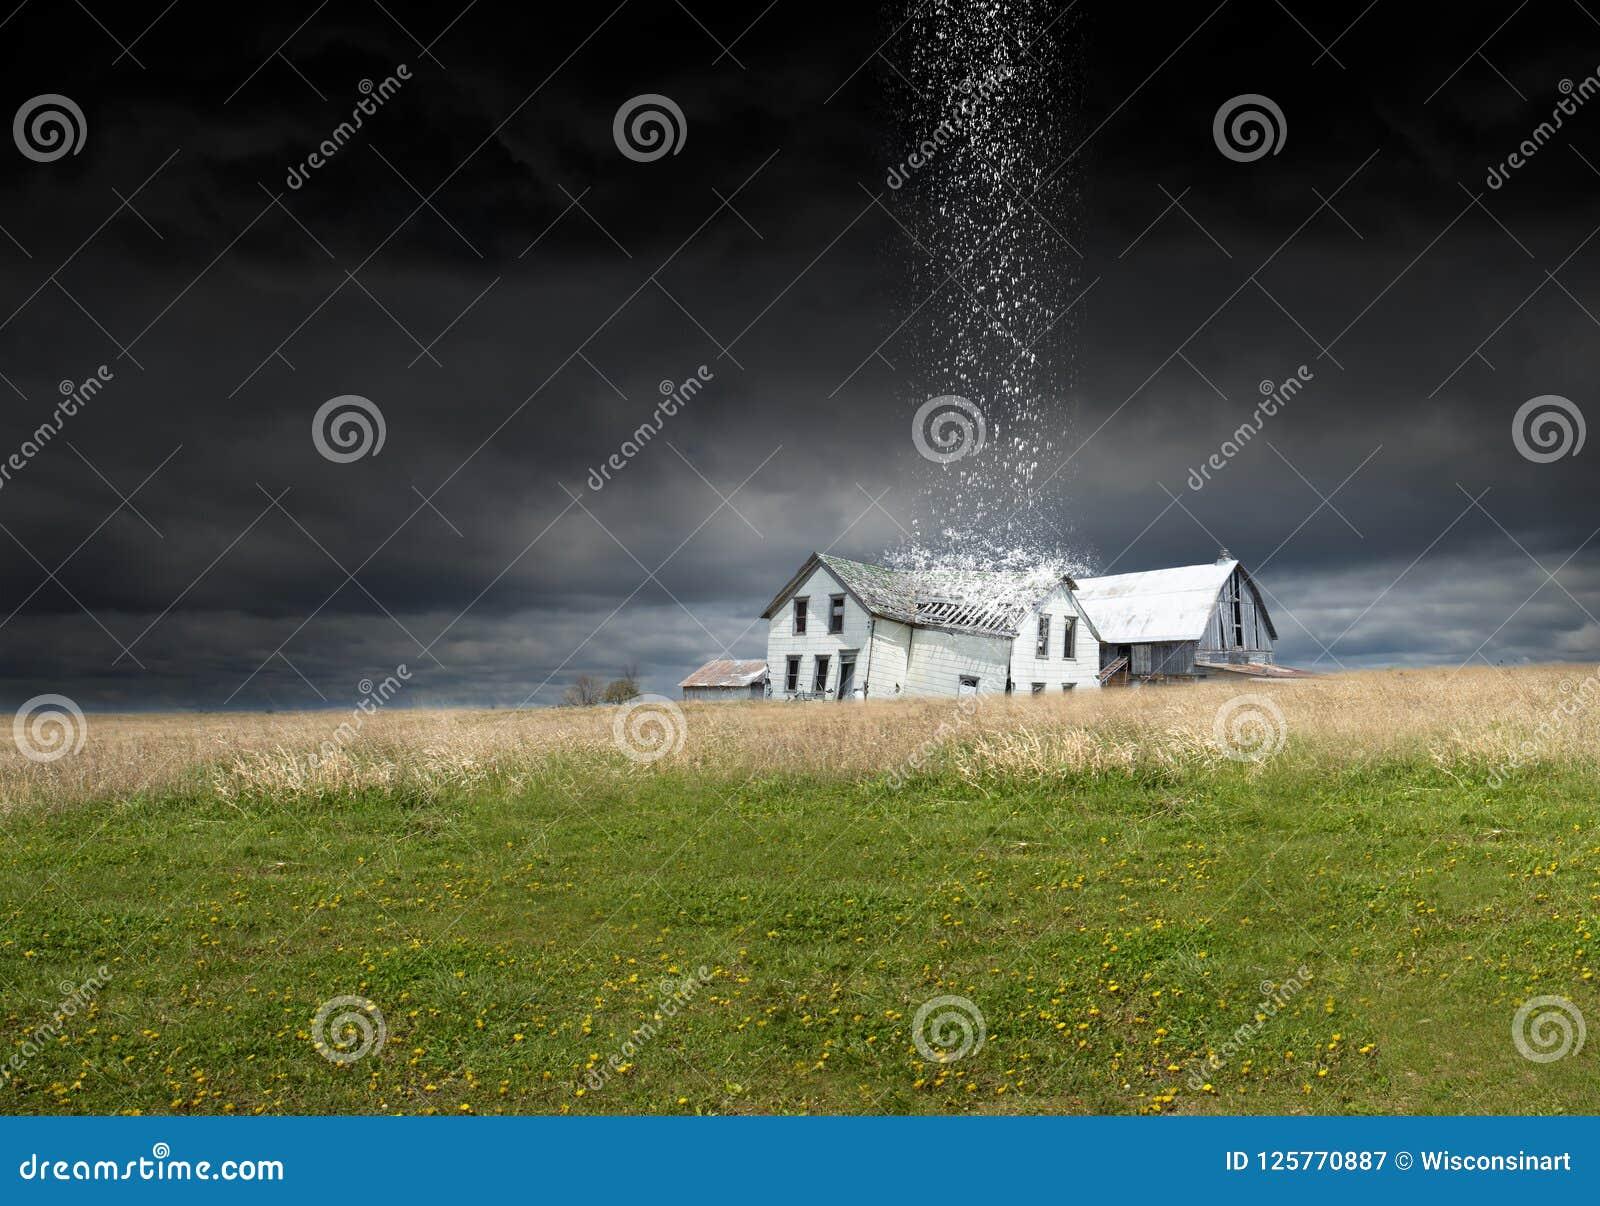 Surreal Rain Storm, Weather, Farm, Barn, Farmhouse